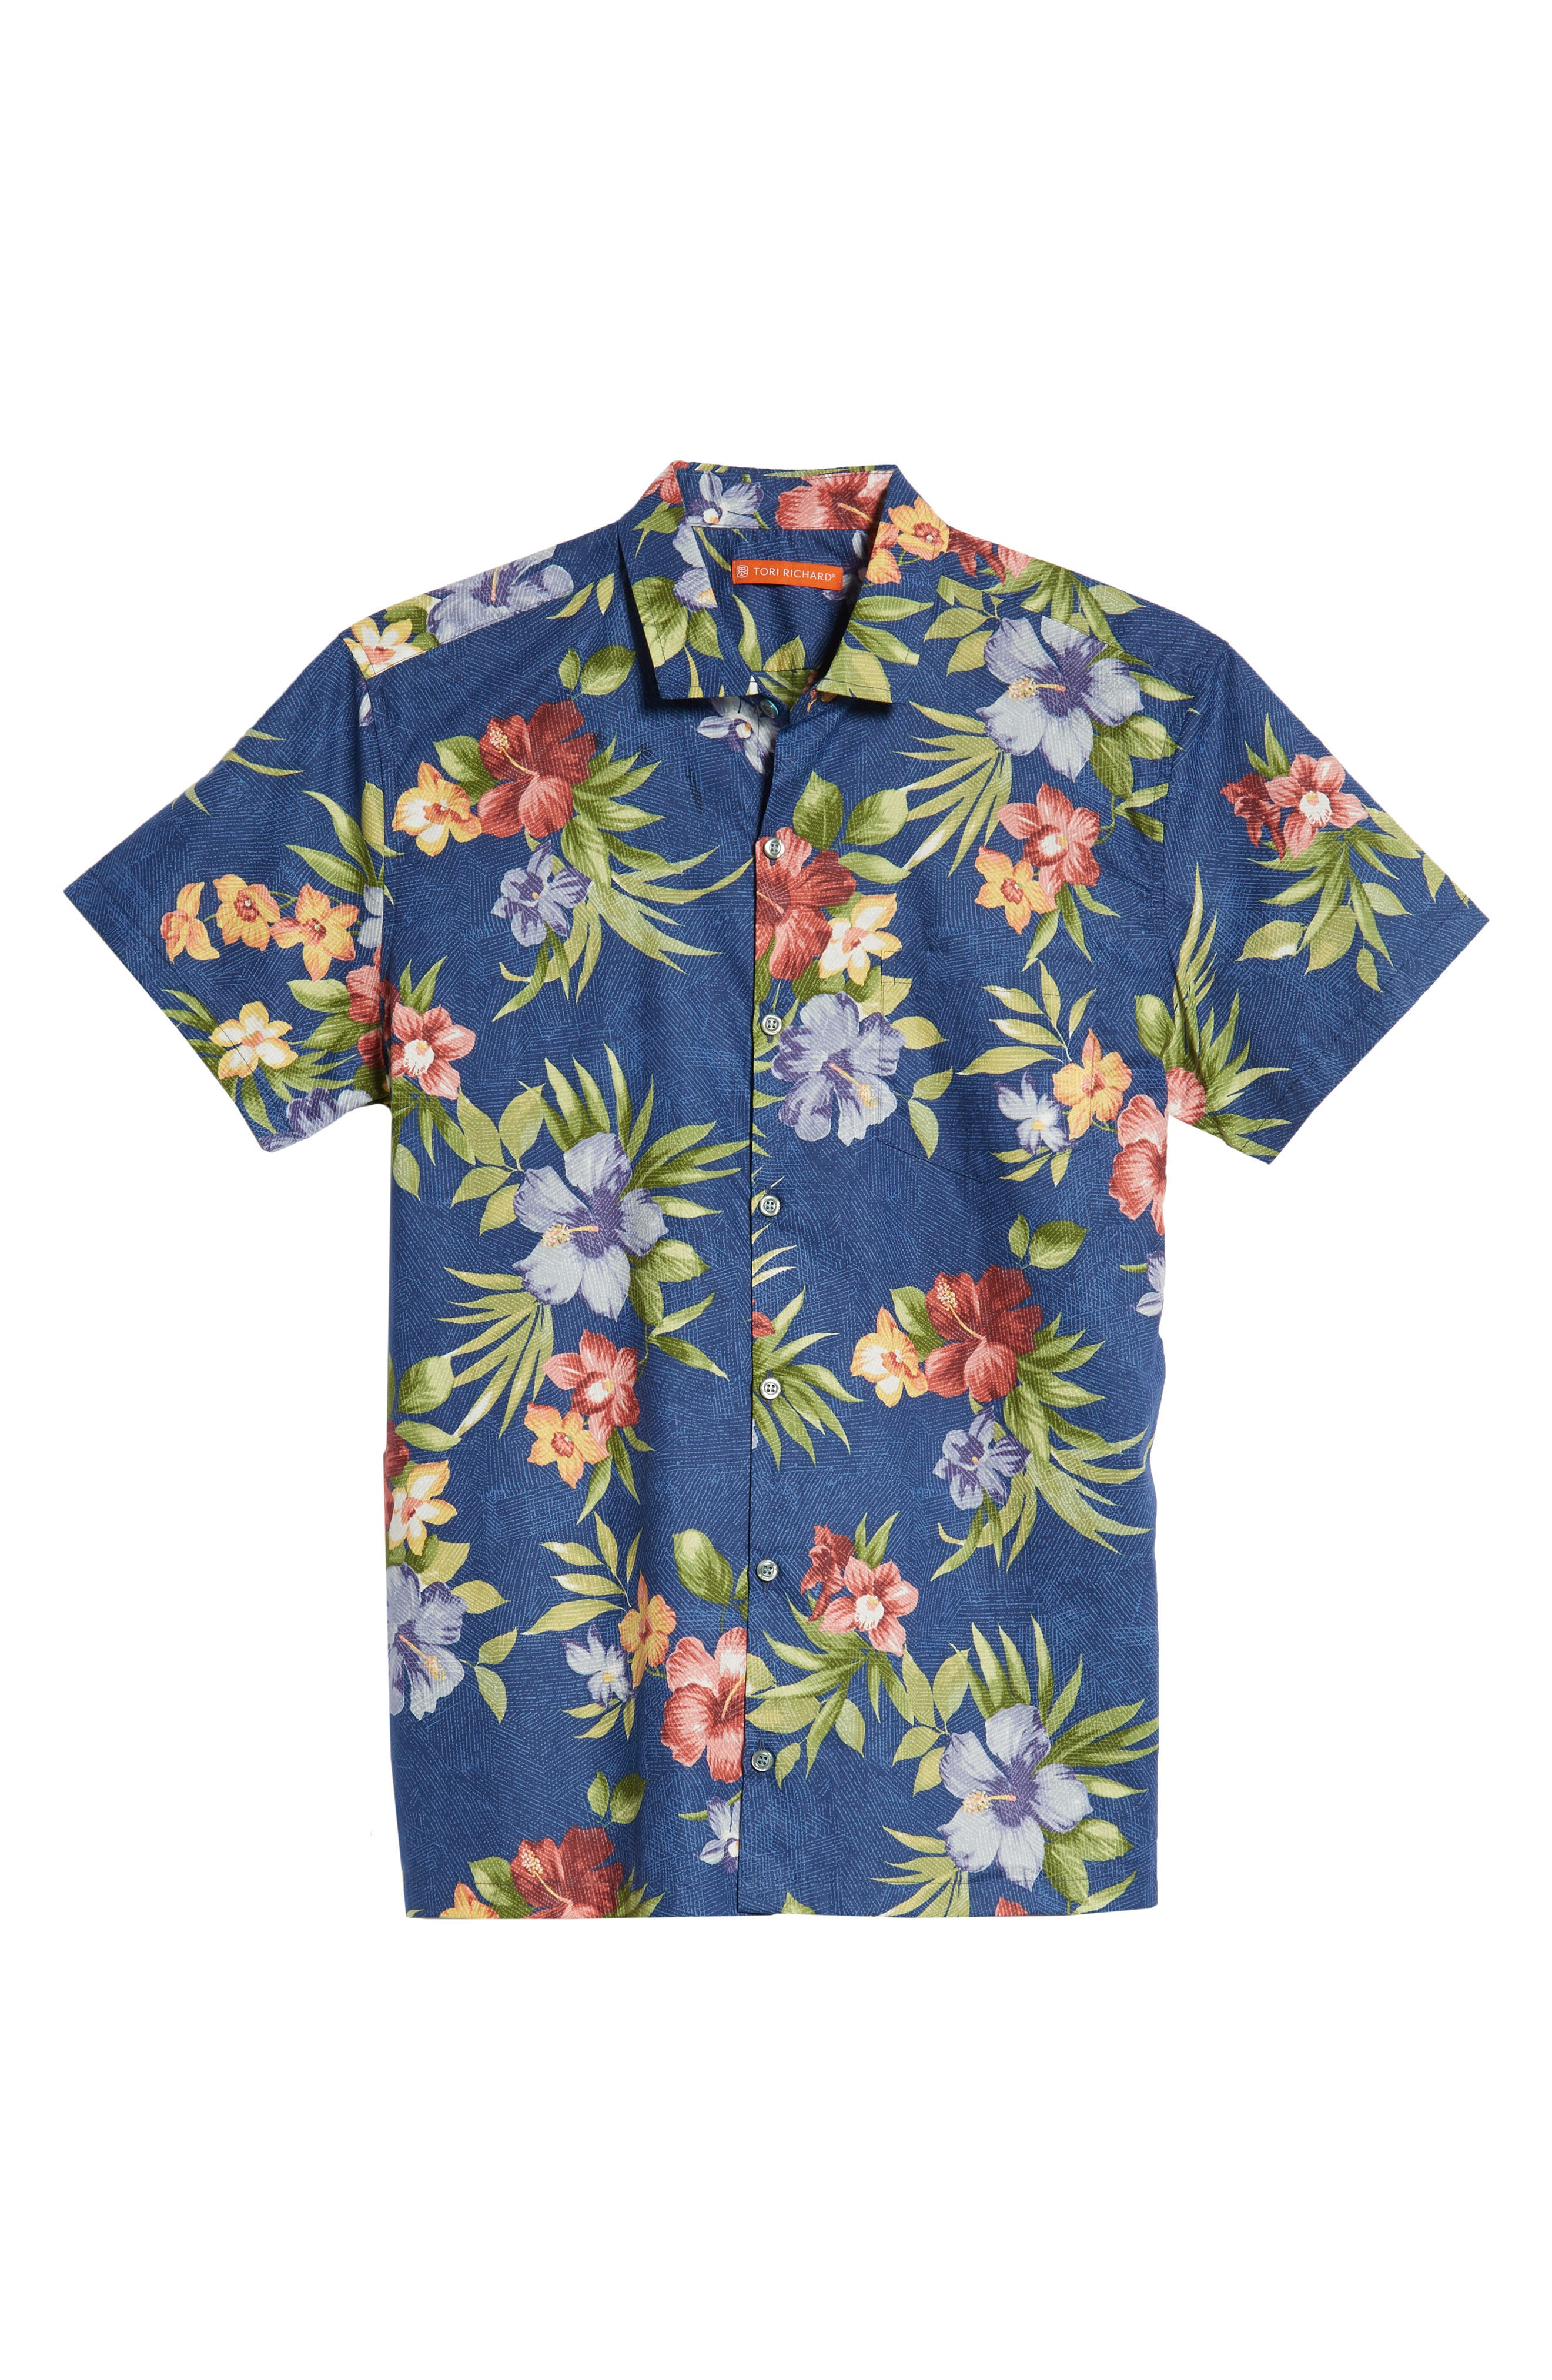 TORI RICHARD,                             Tropical Filter Trim Fit Camp Shirt,                             Alternate thumbnail 5, color,                             415